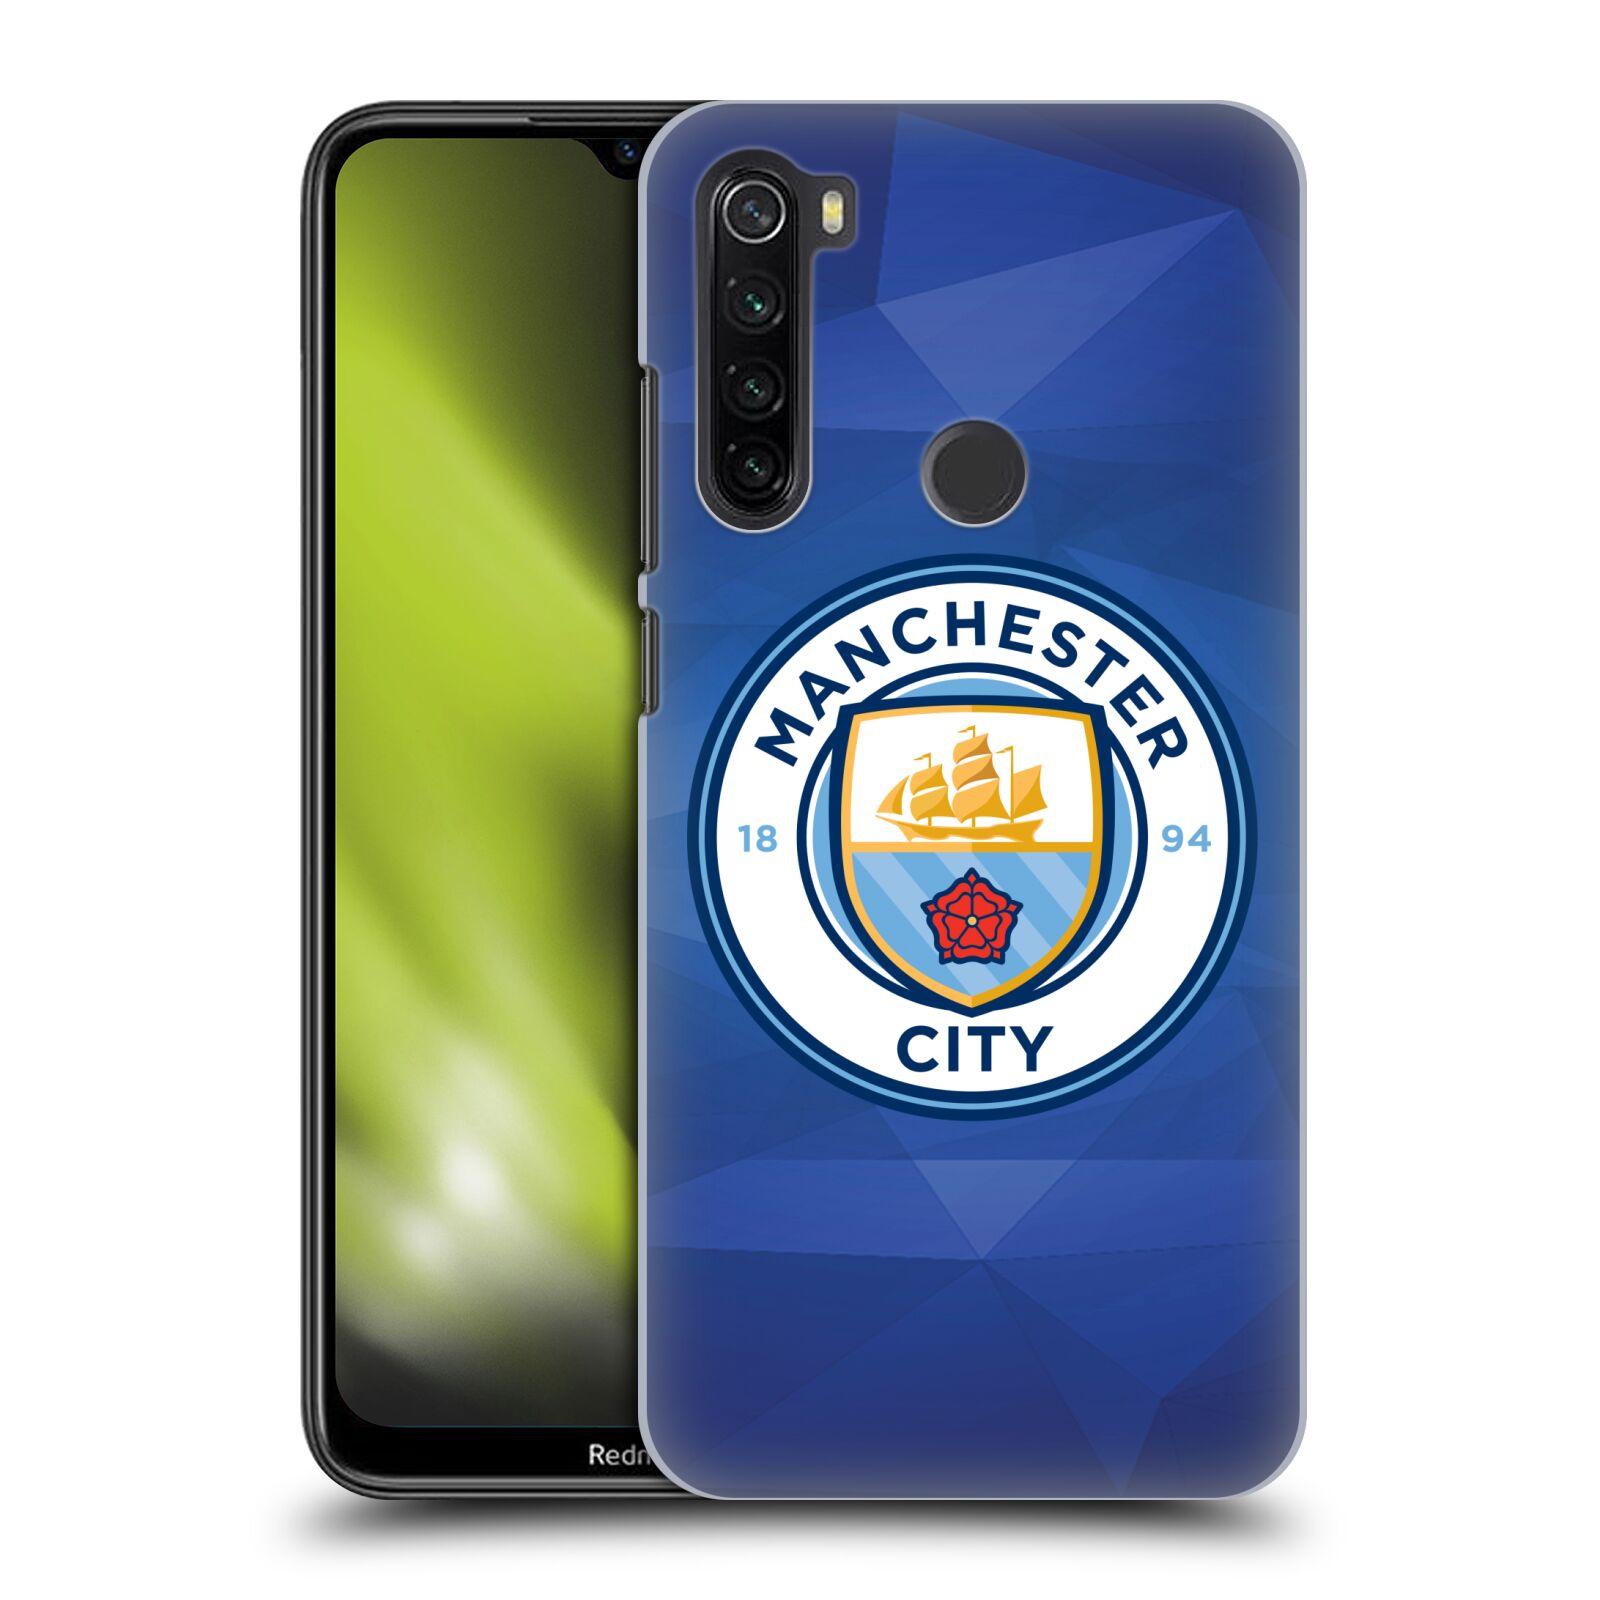 Plastové pouzdro na mobil Xiaomi Redmi Note 8T - Head Case - Manchester City FC - Modré nové logo